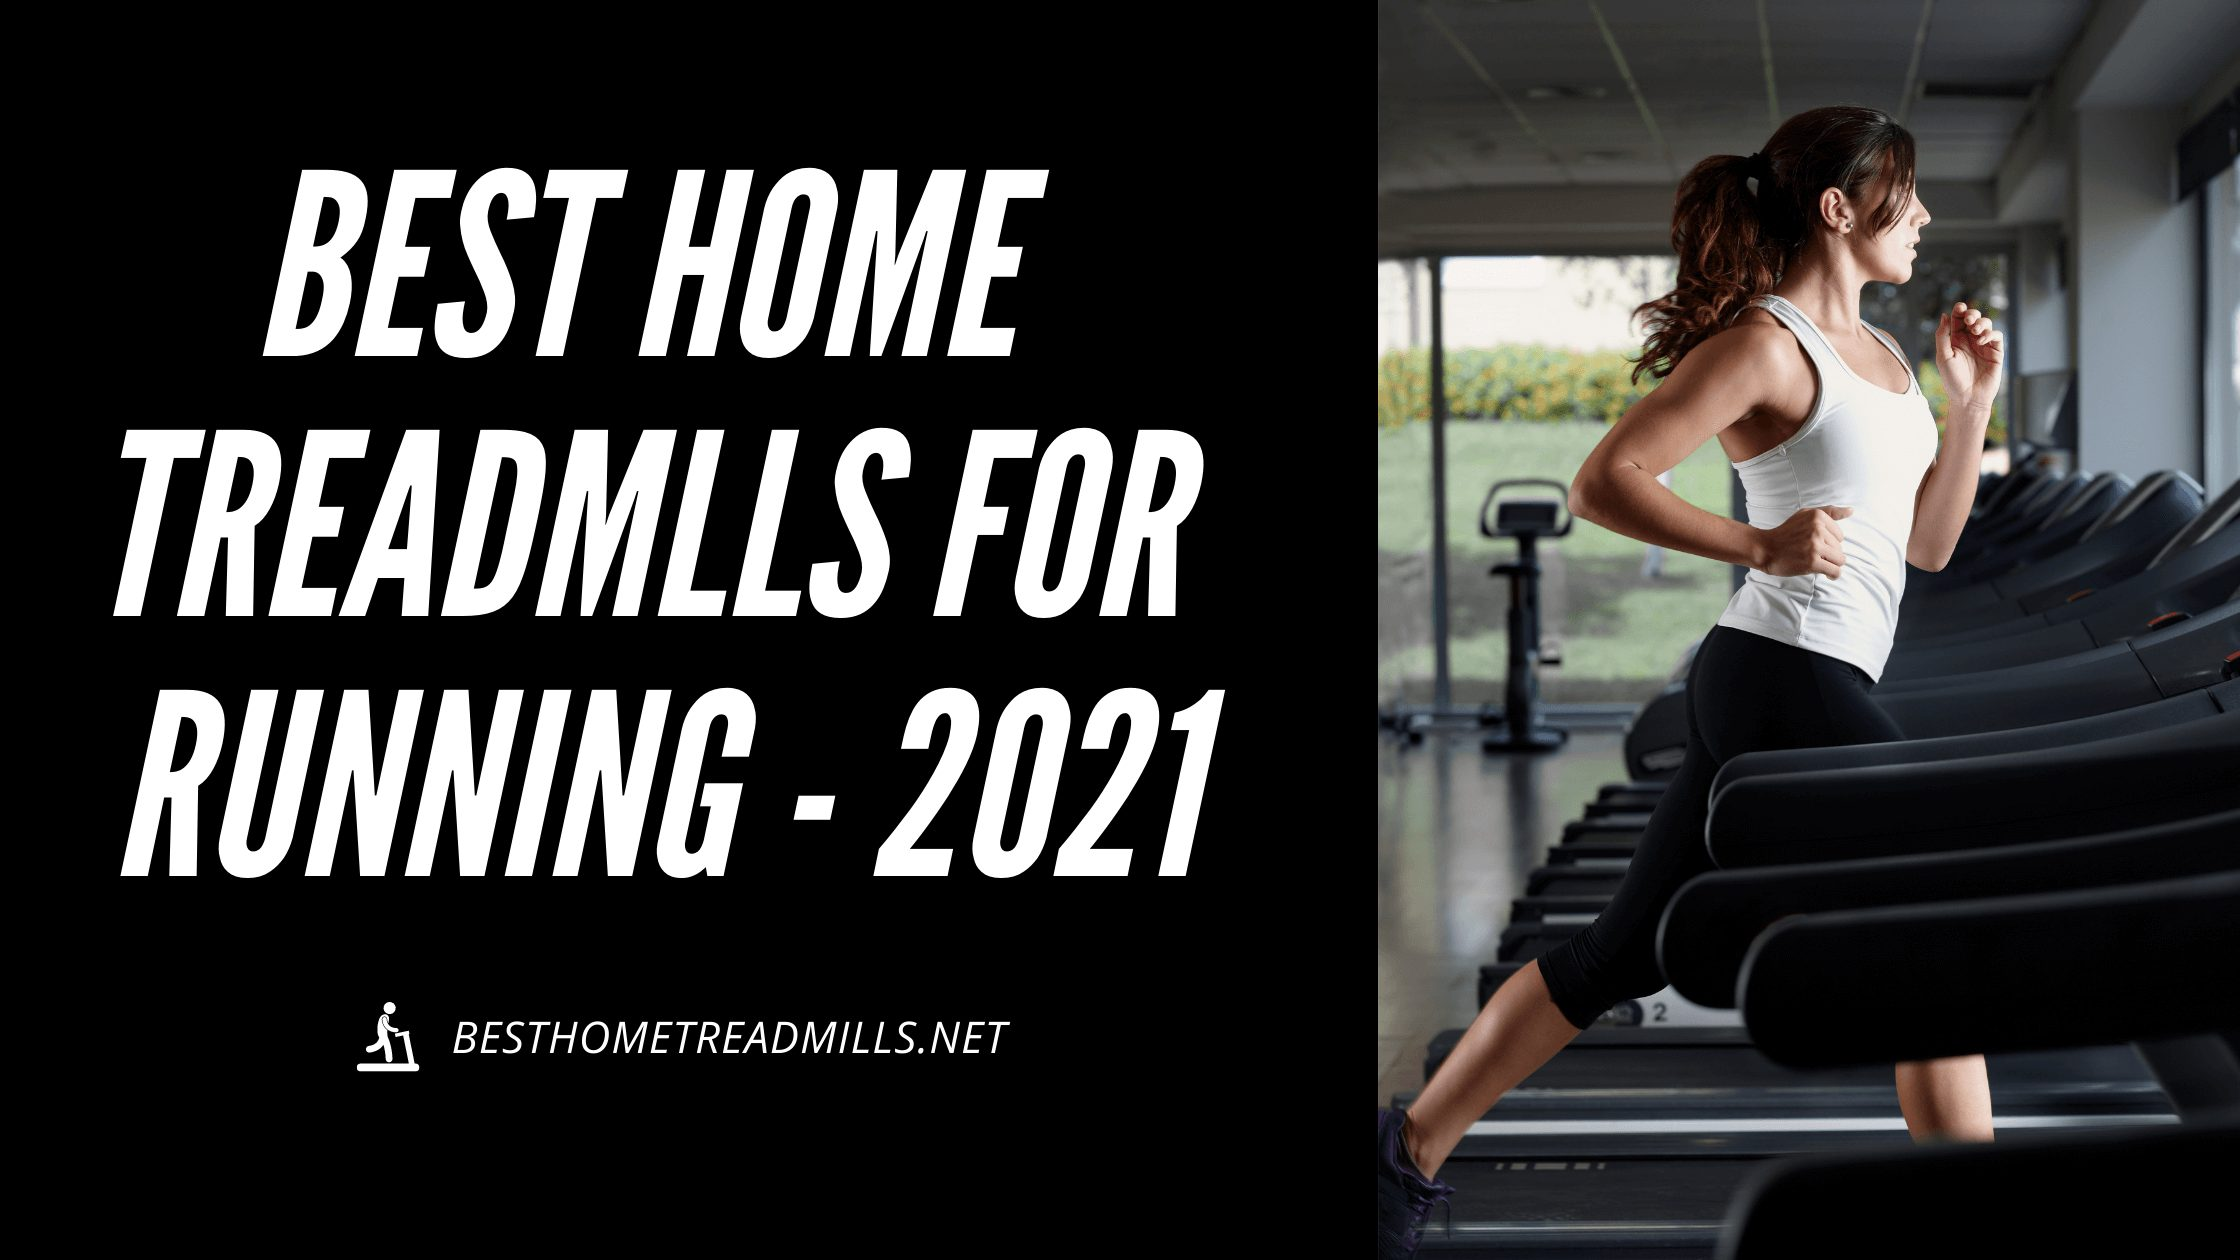 Best Home Treadmills for Running 2021